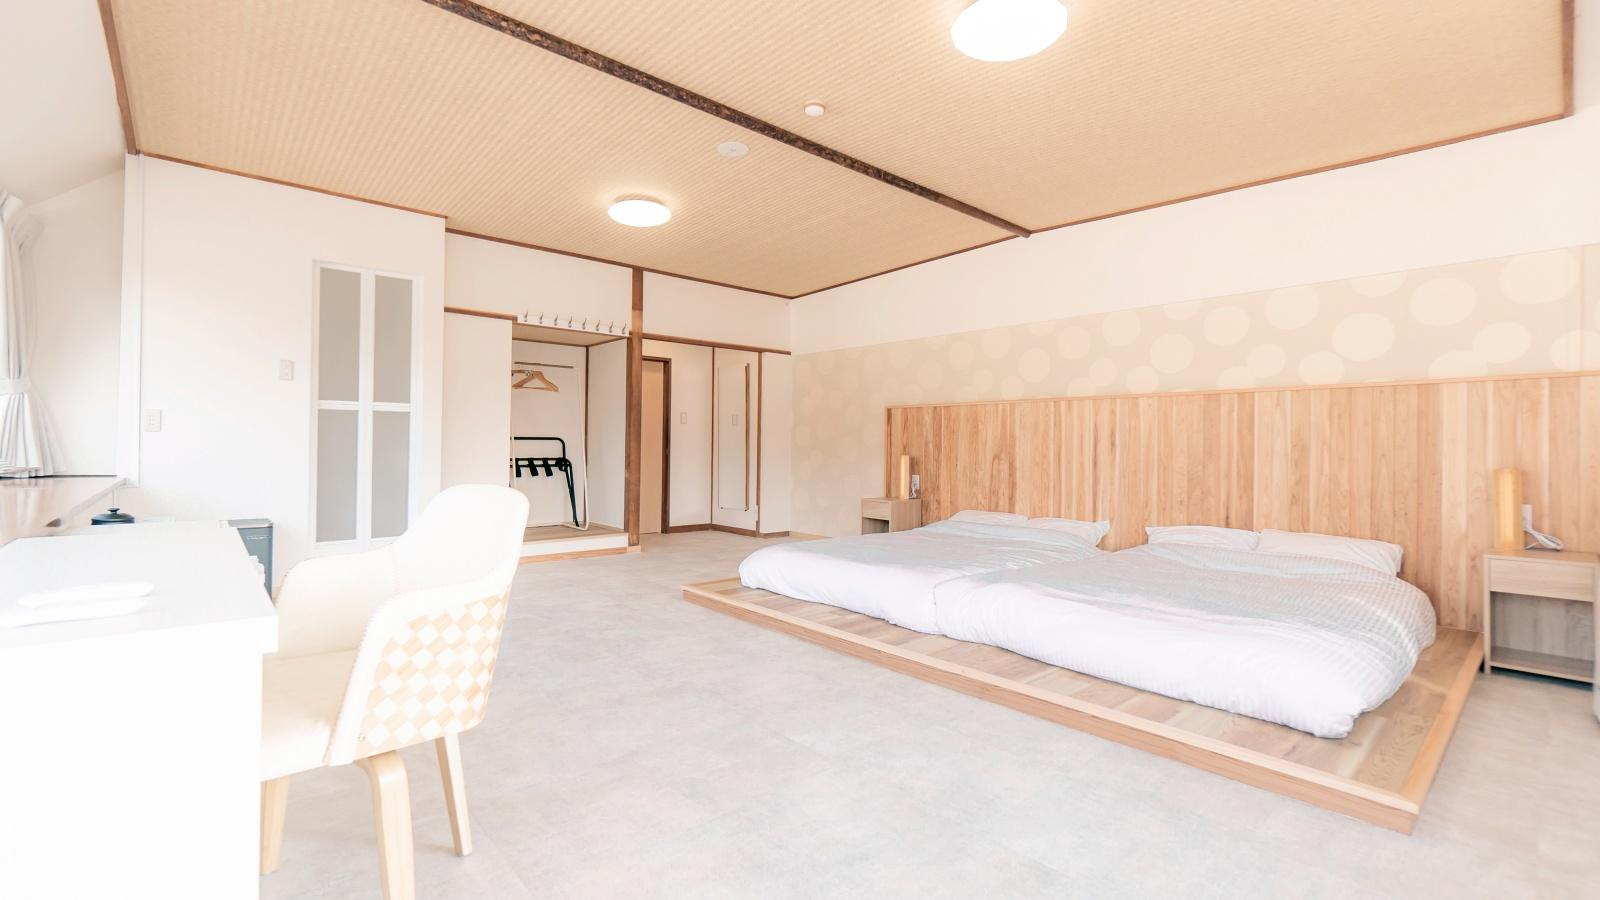 VOYAN Resort富士山中湖・月湖荘-2